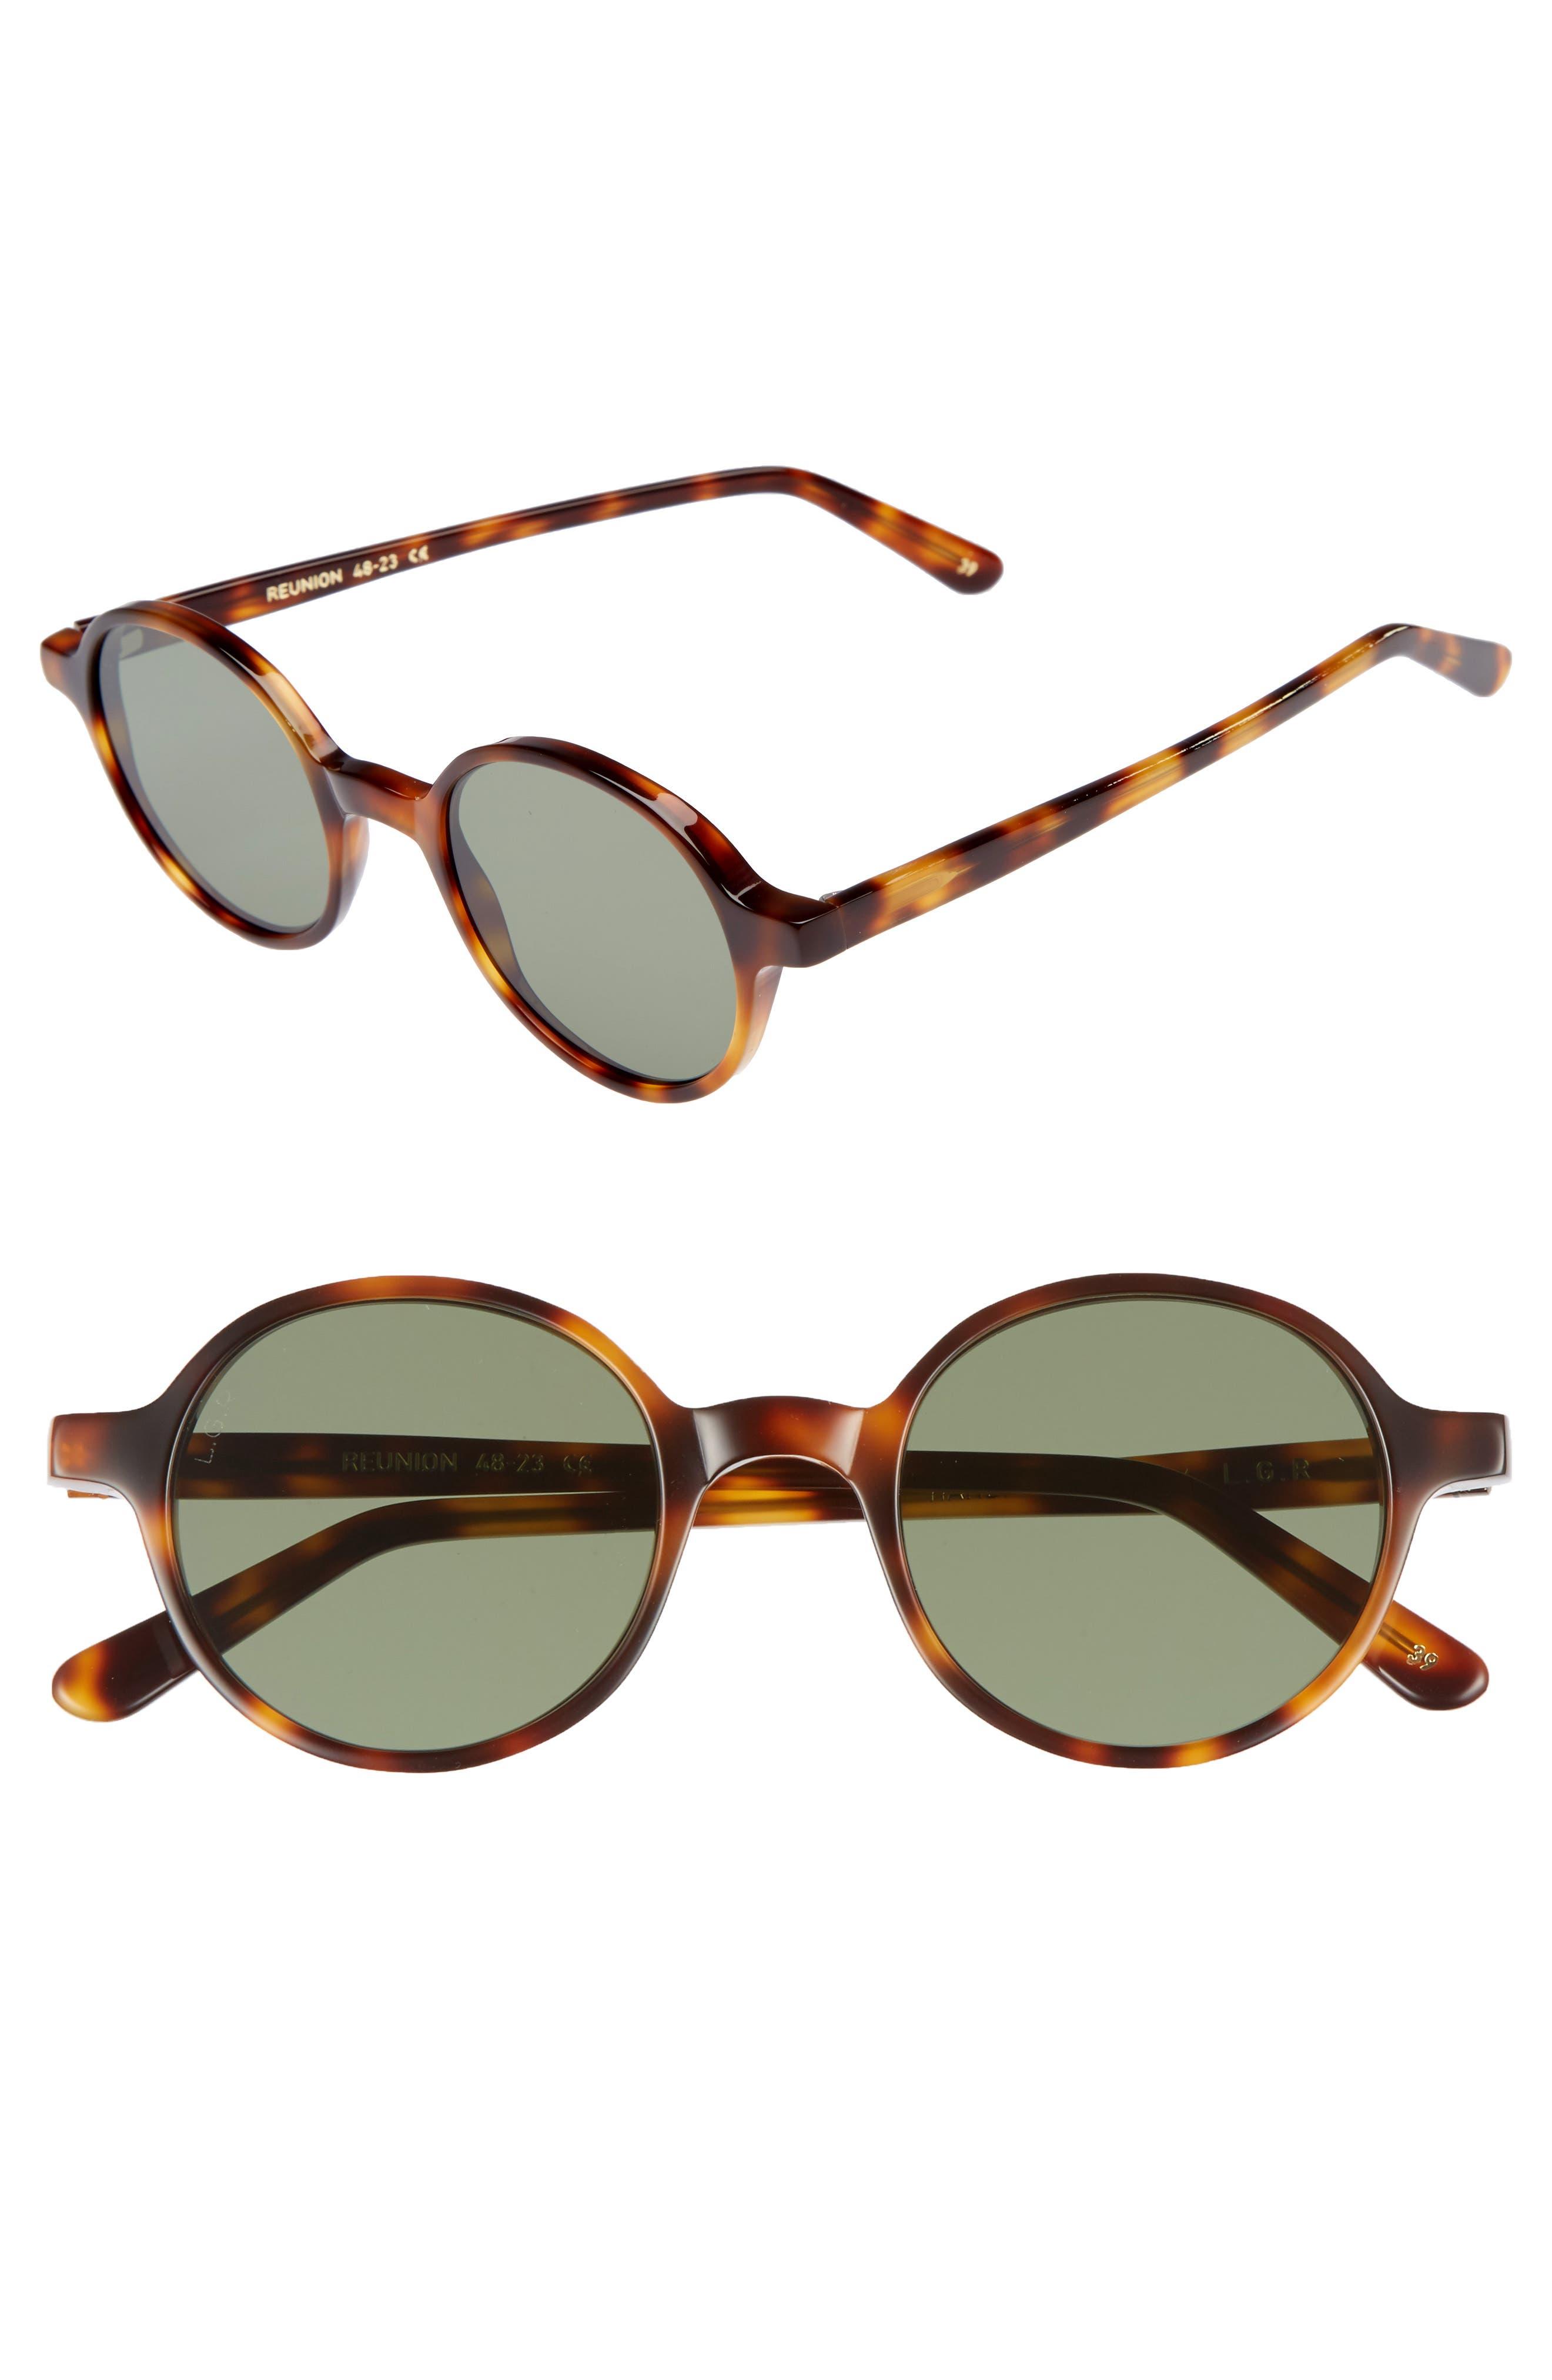 Reunion 48mm Sunglasses,                         Main,                         color, 200